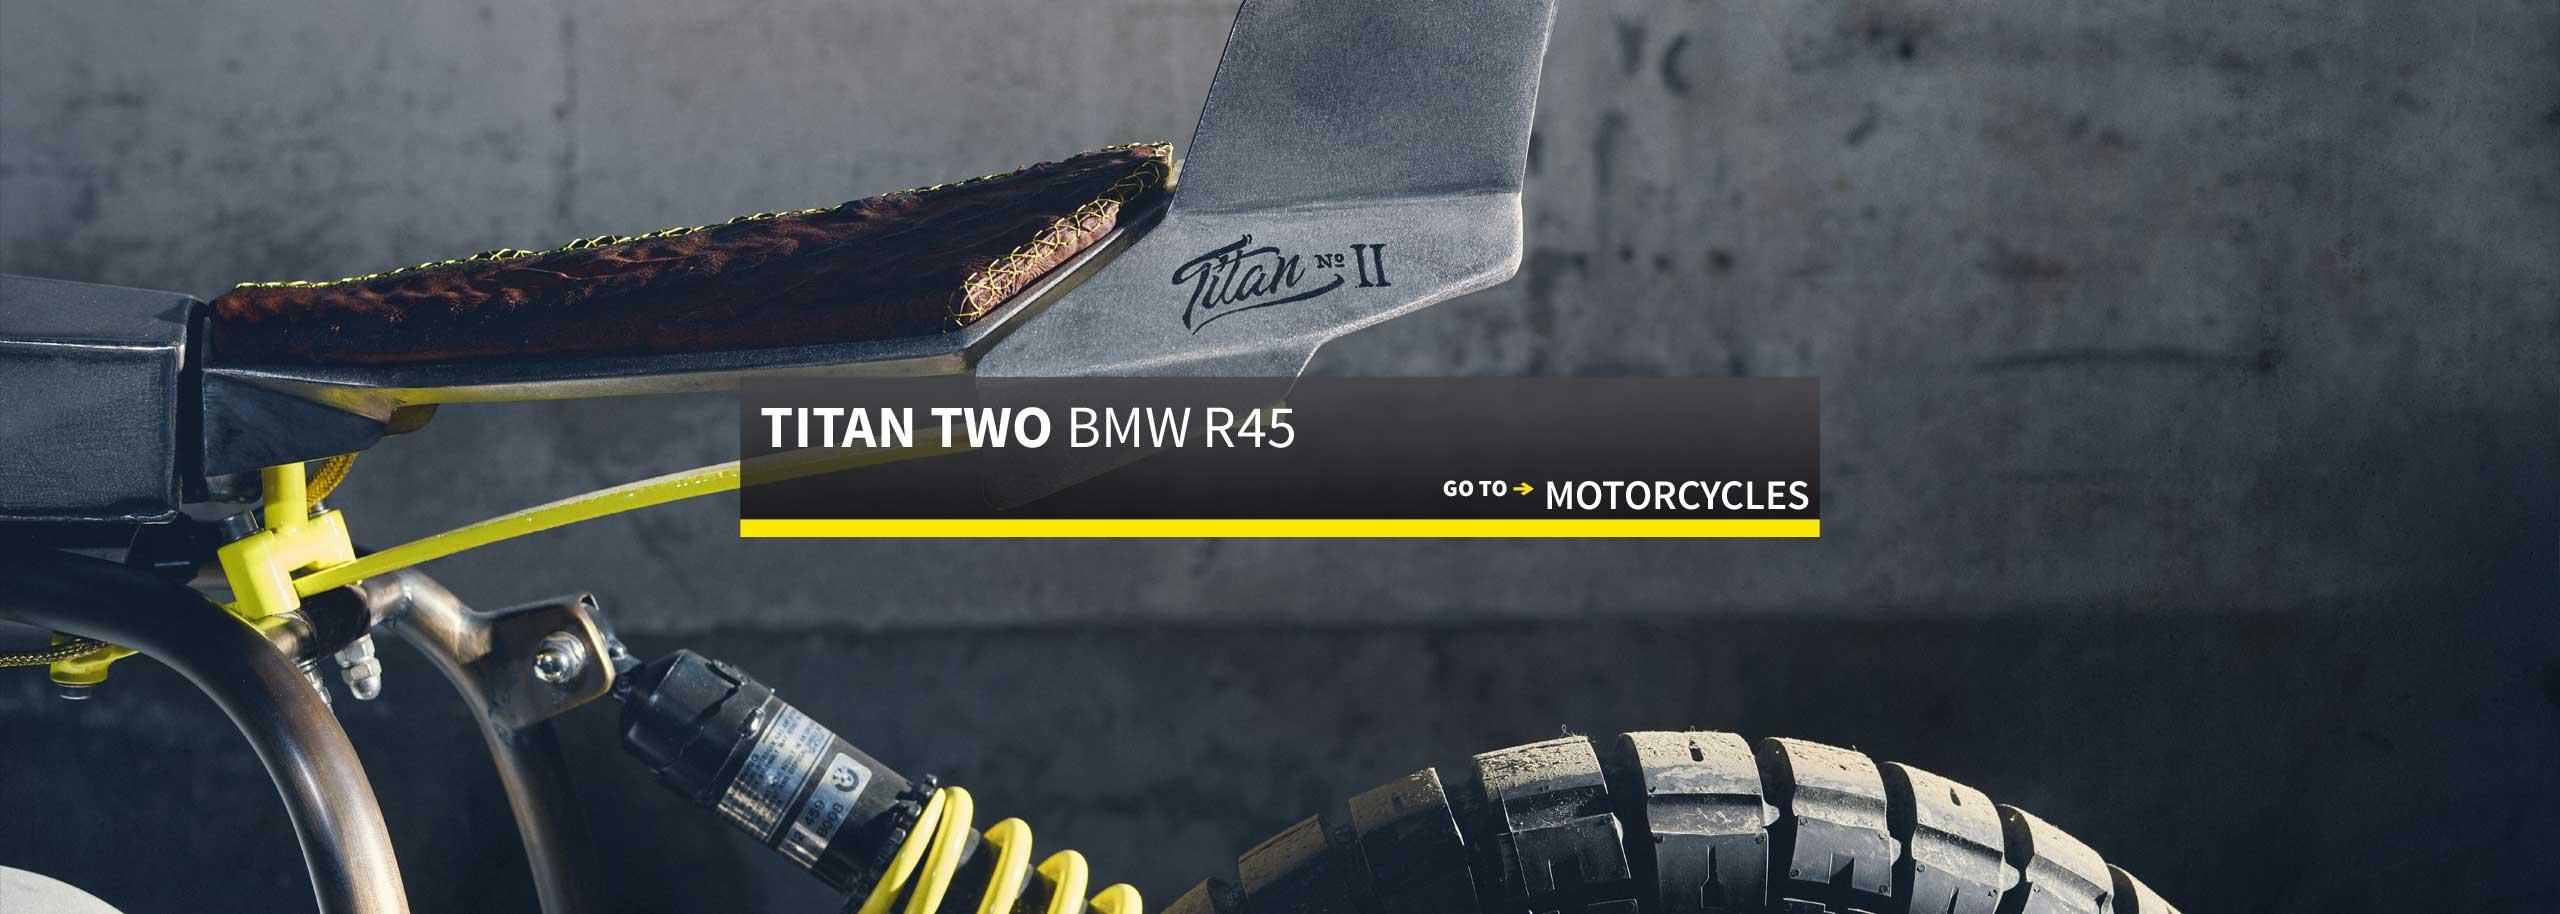 07-Titan-Motorcycles_TITAN-Two-BMW-Motorrad-Concept-Studie-CafeRacer-CustomBike-Graz-Austria